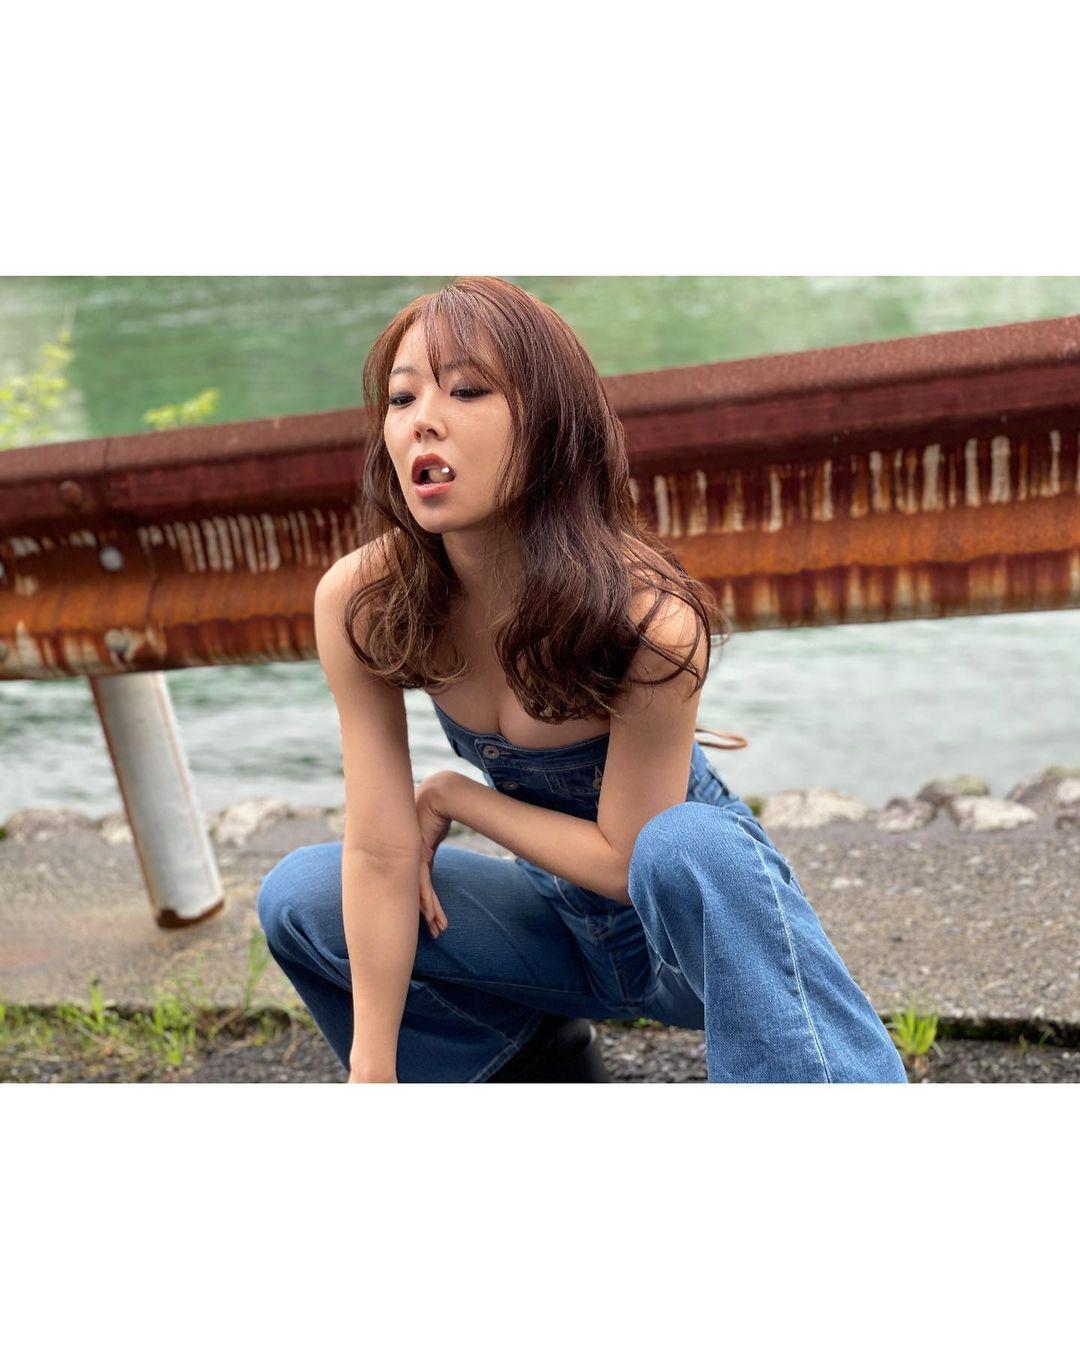 NMB48白間美瑠「色っぽくてかっこいい!」写真集『REBORN』オフショット公開にファン歓喜【画像8枚】の画像001